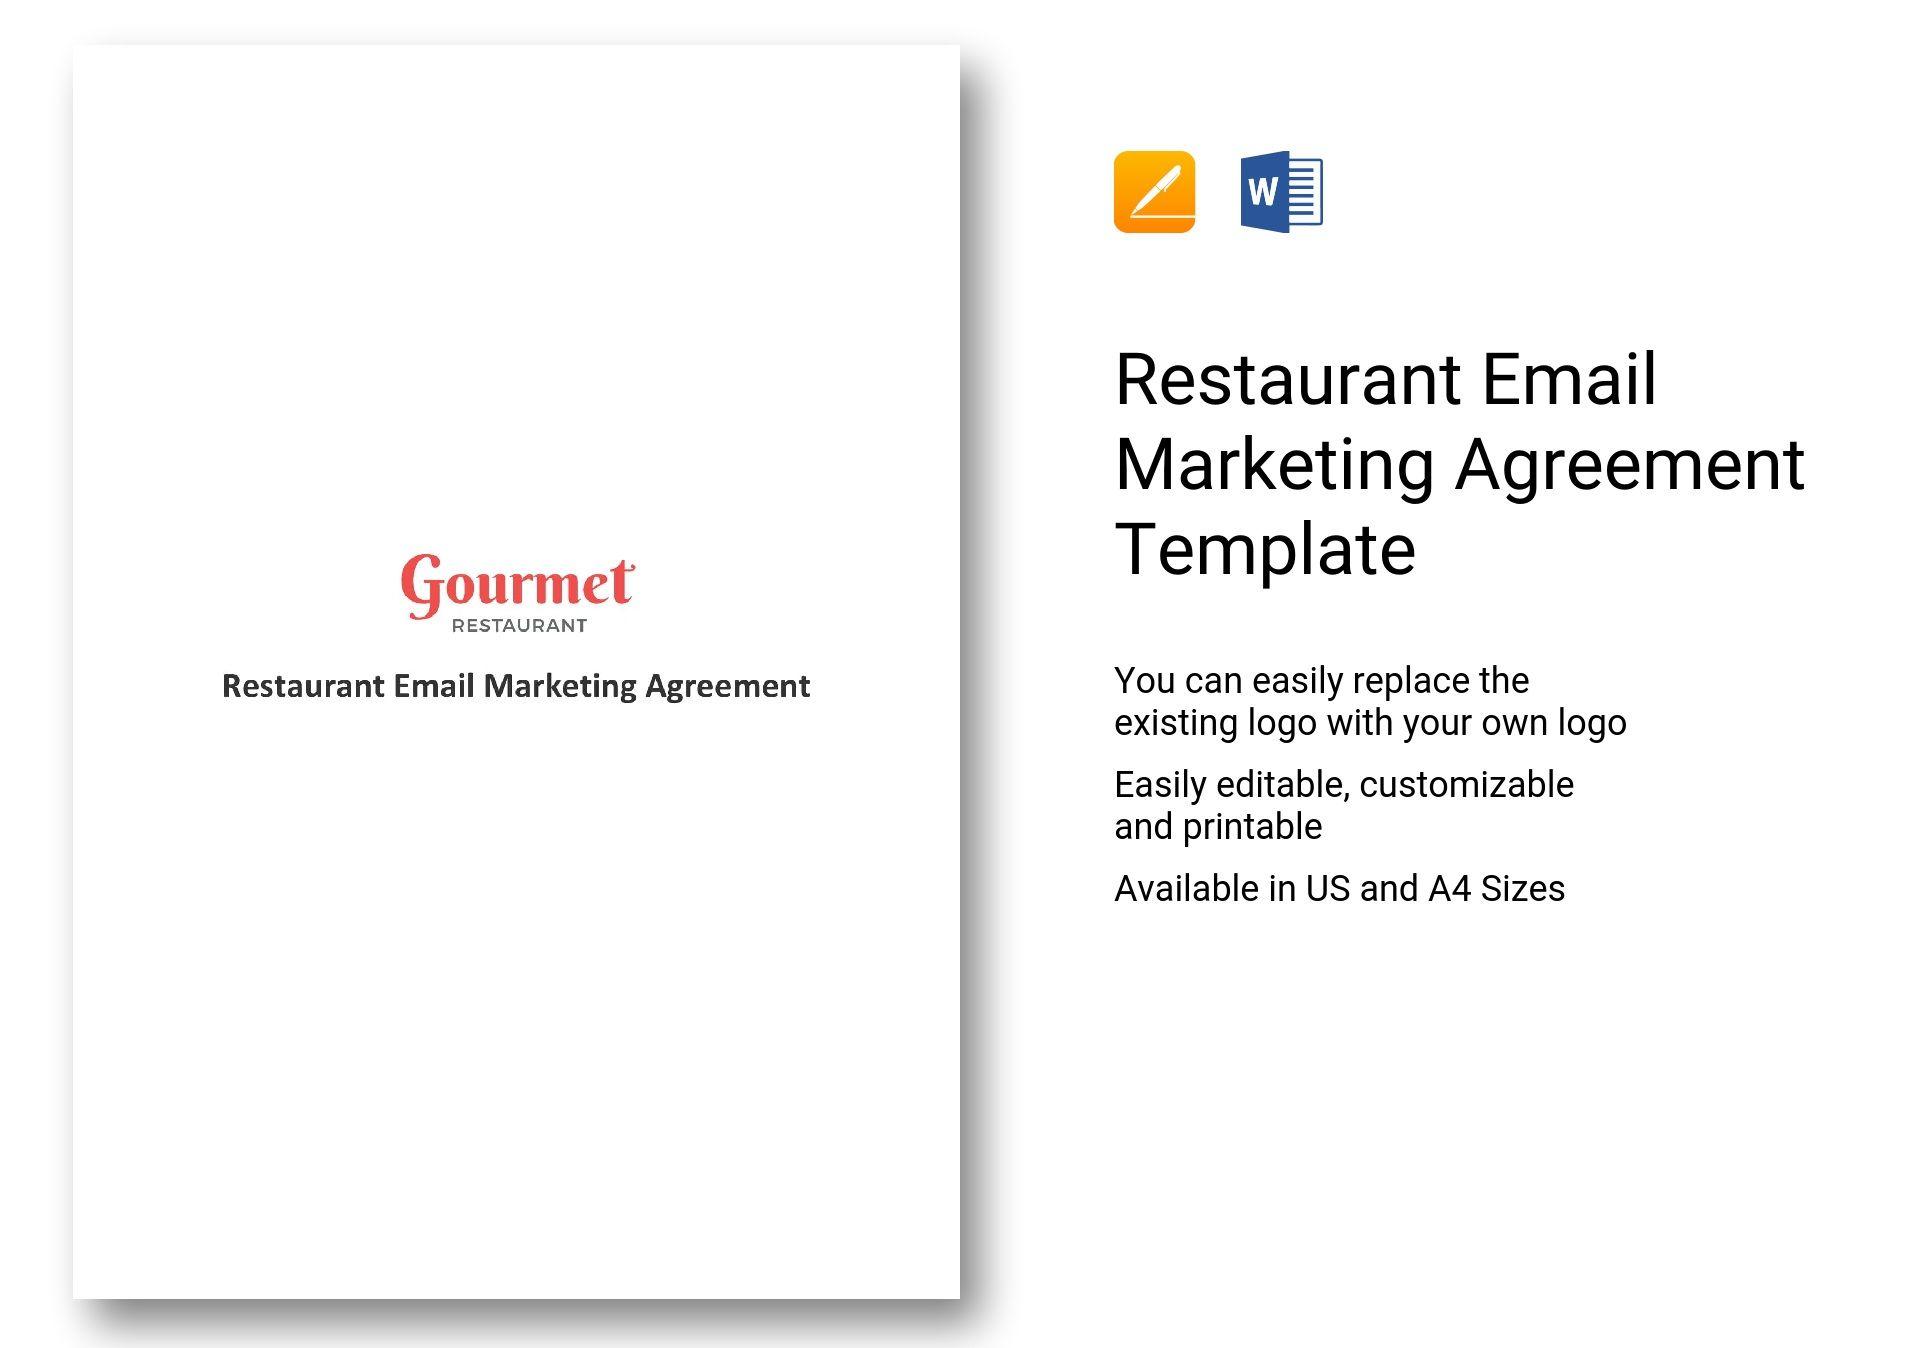 Restaurant Email Marketing Agreement